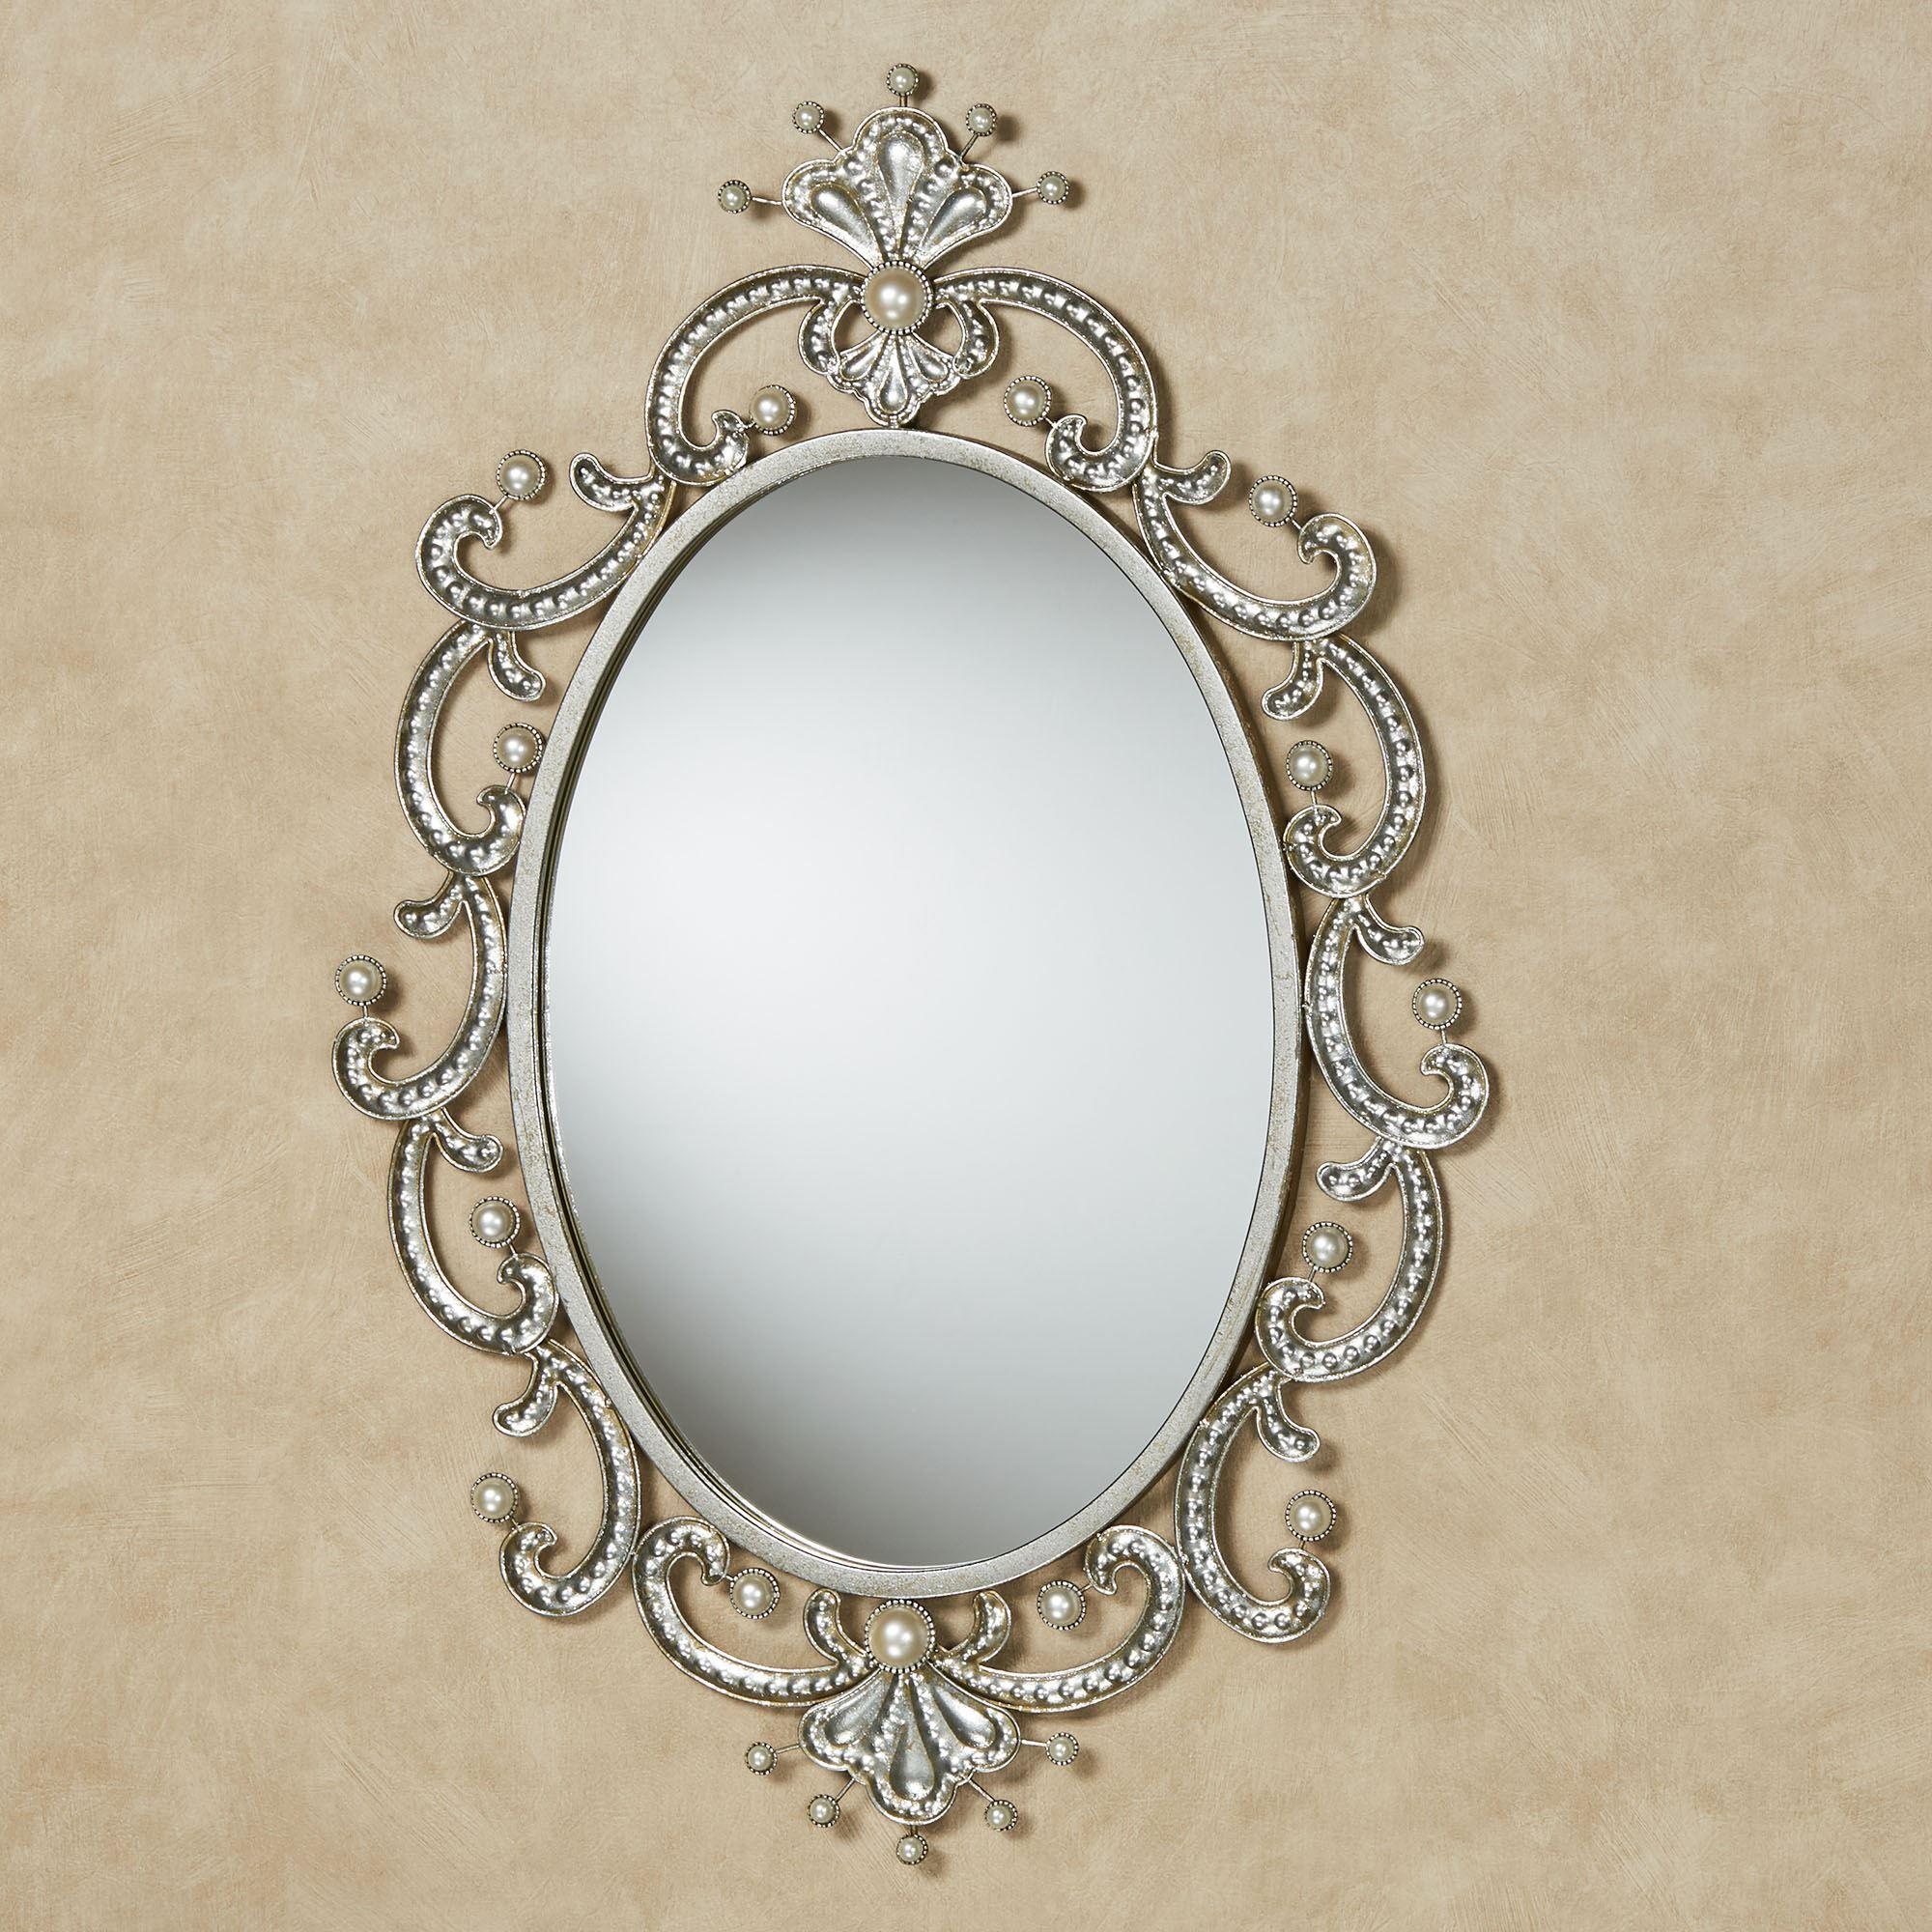 Giorgianna Pearl Oval Wall Mirror